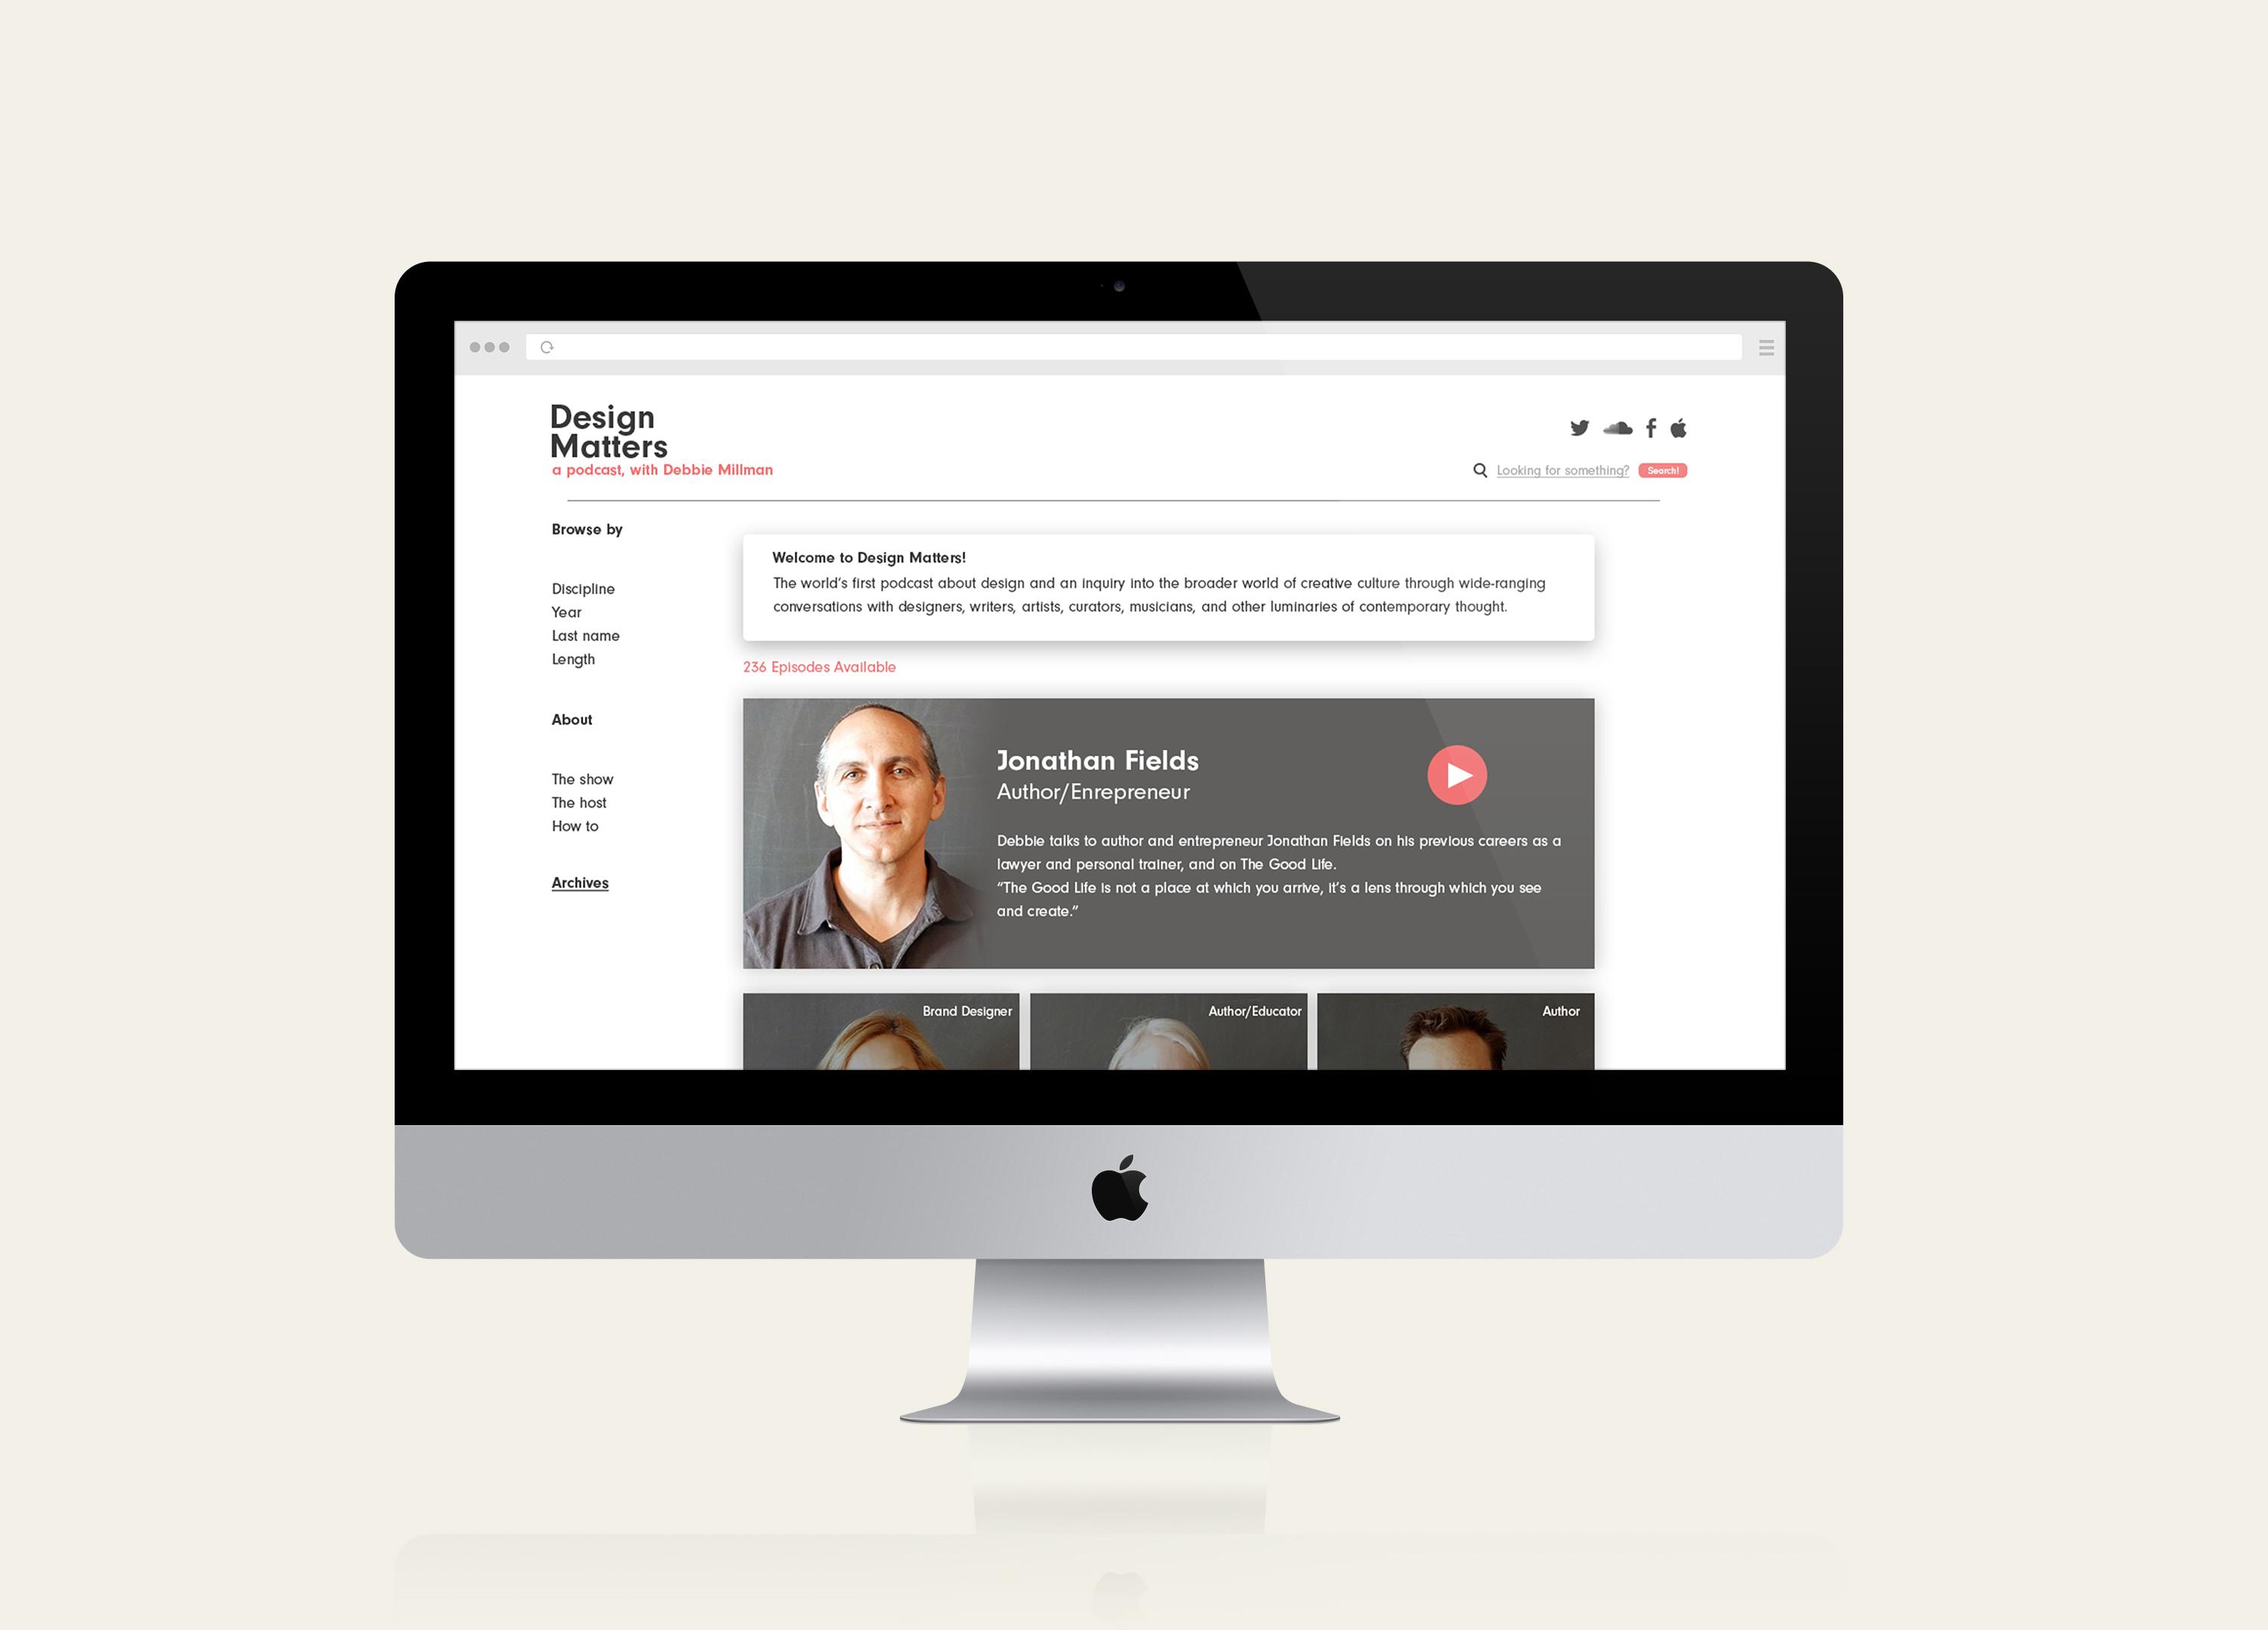 design-matters-mac